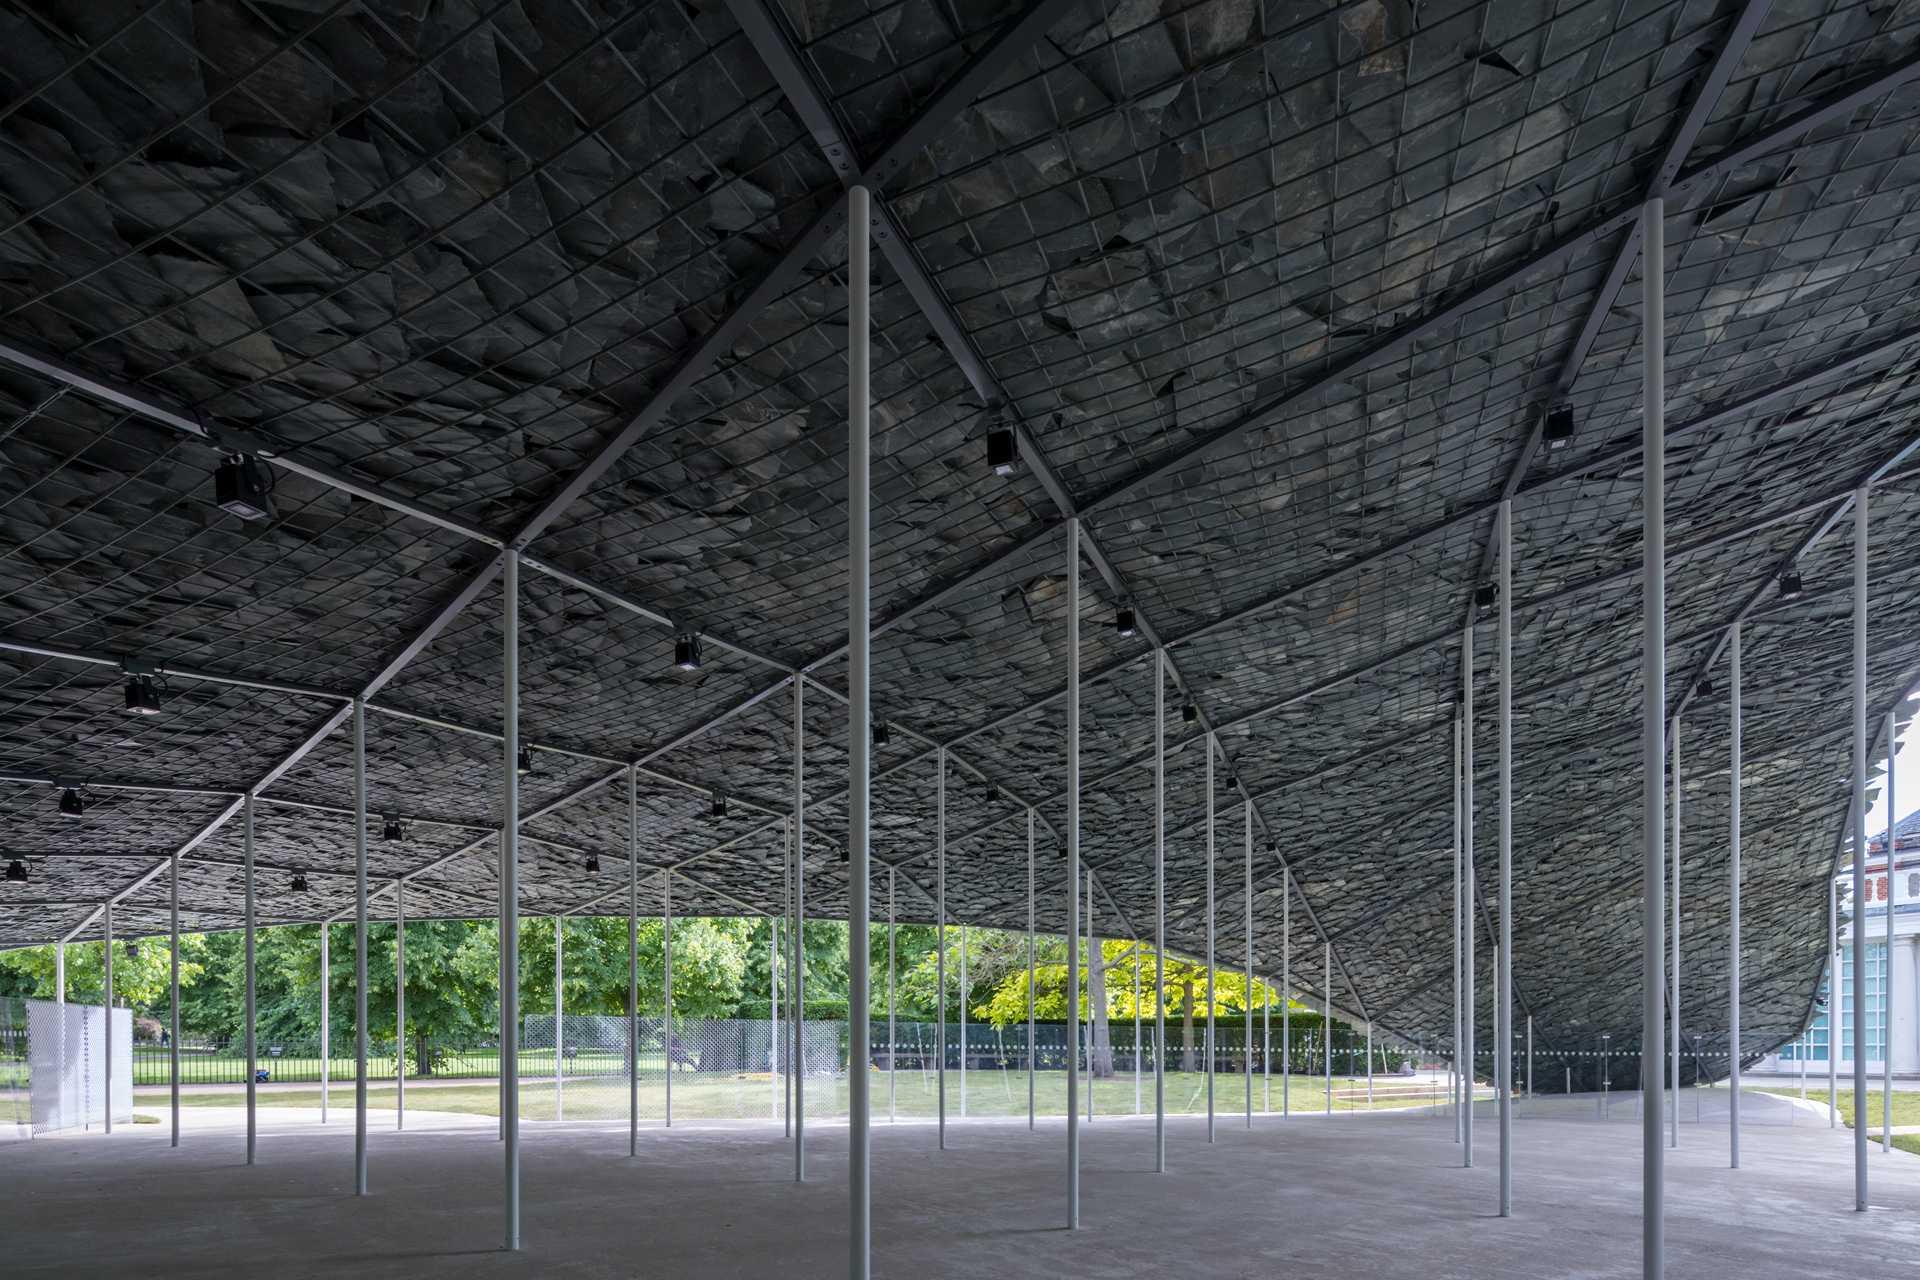 Serpentine Pavilion 2019  - 5 Iwan Baan 2 40